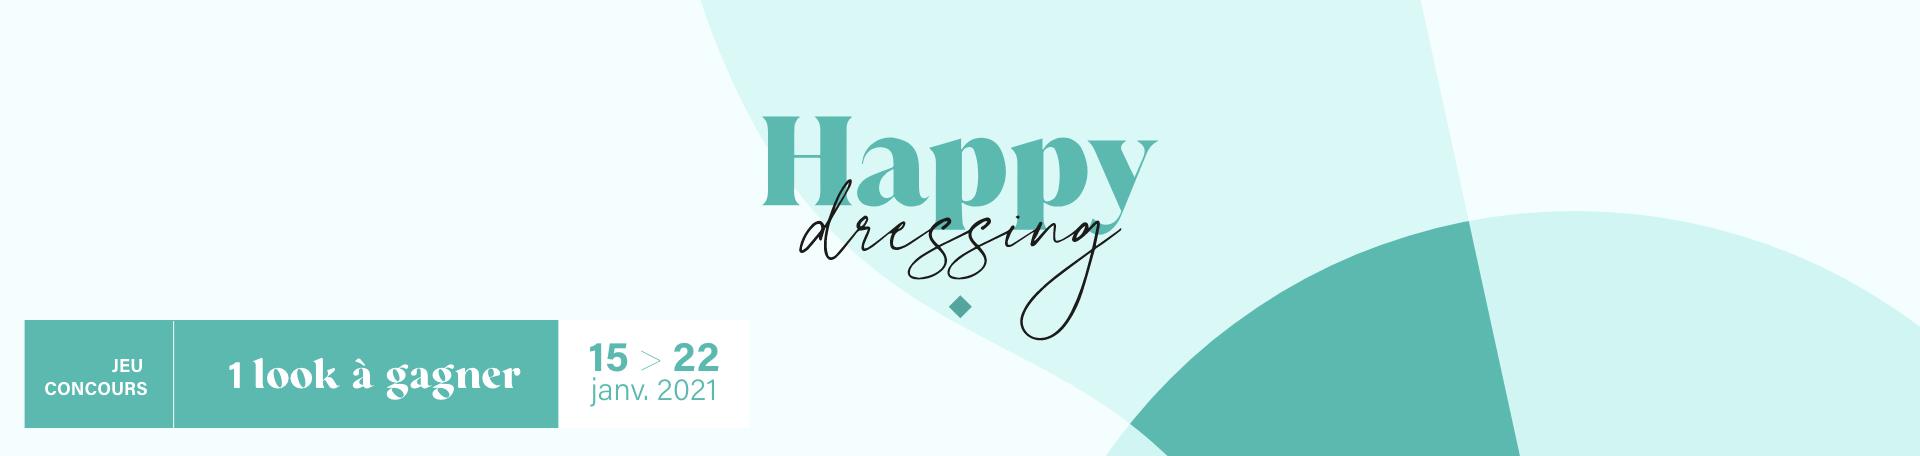 Jeu concours : Happy Dressing